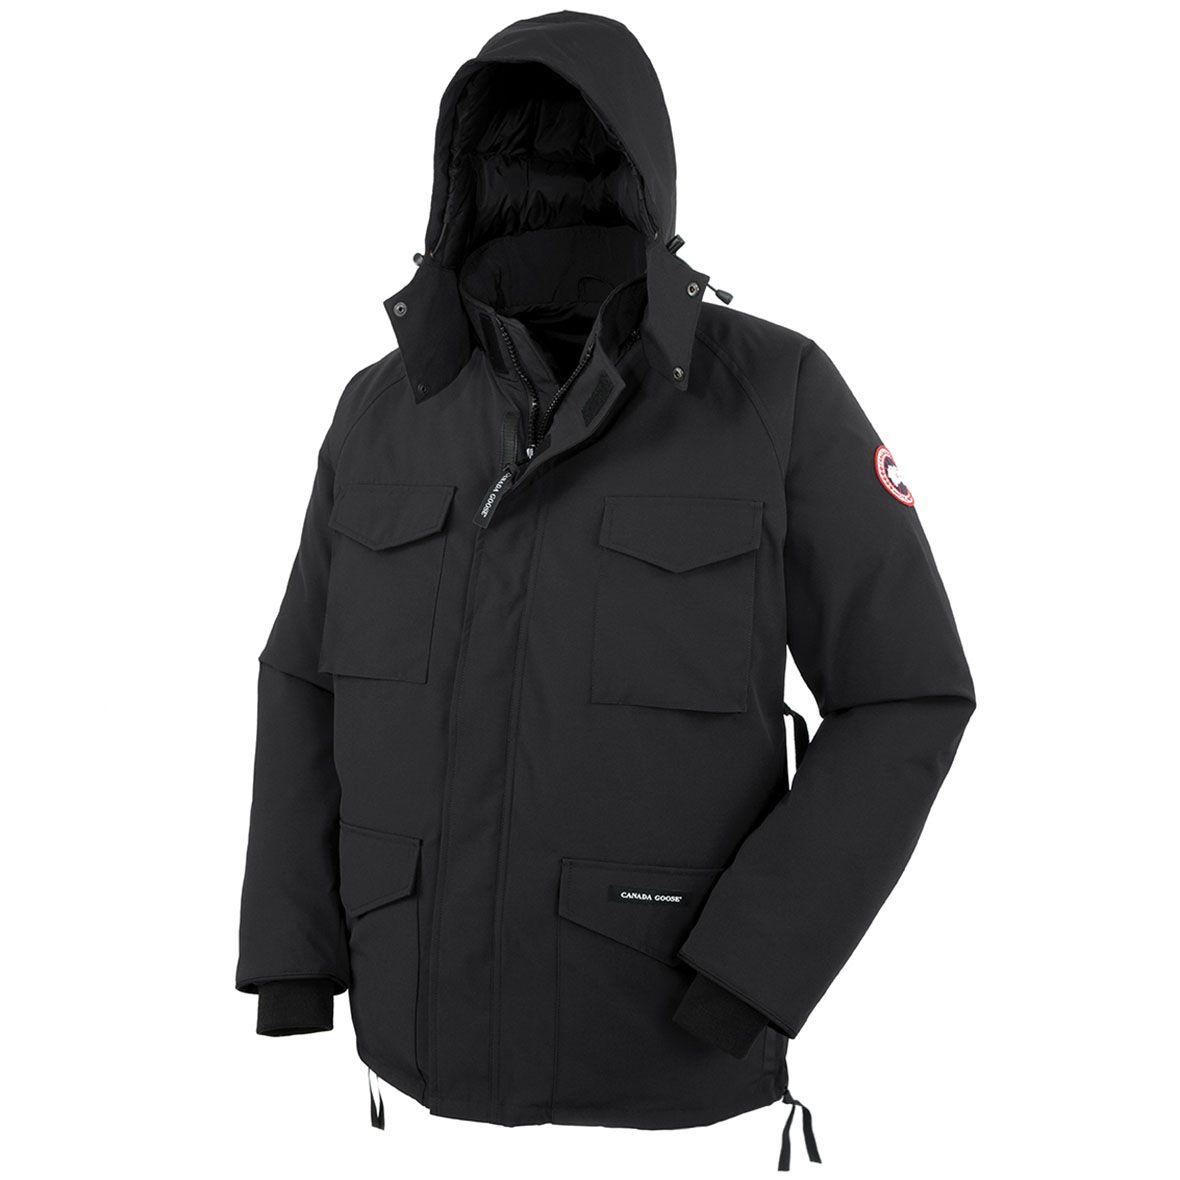 9422a98b540 Canada Goose, Mens Constable Parka - SportingLife Online Store